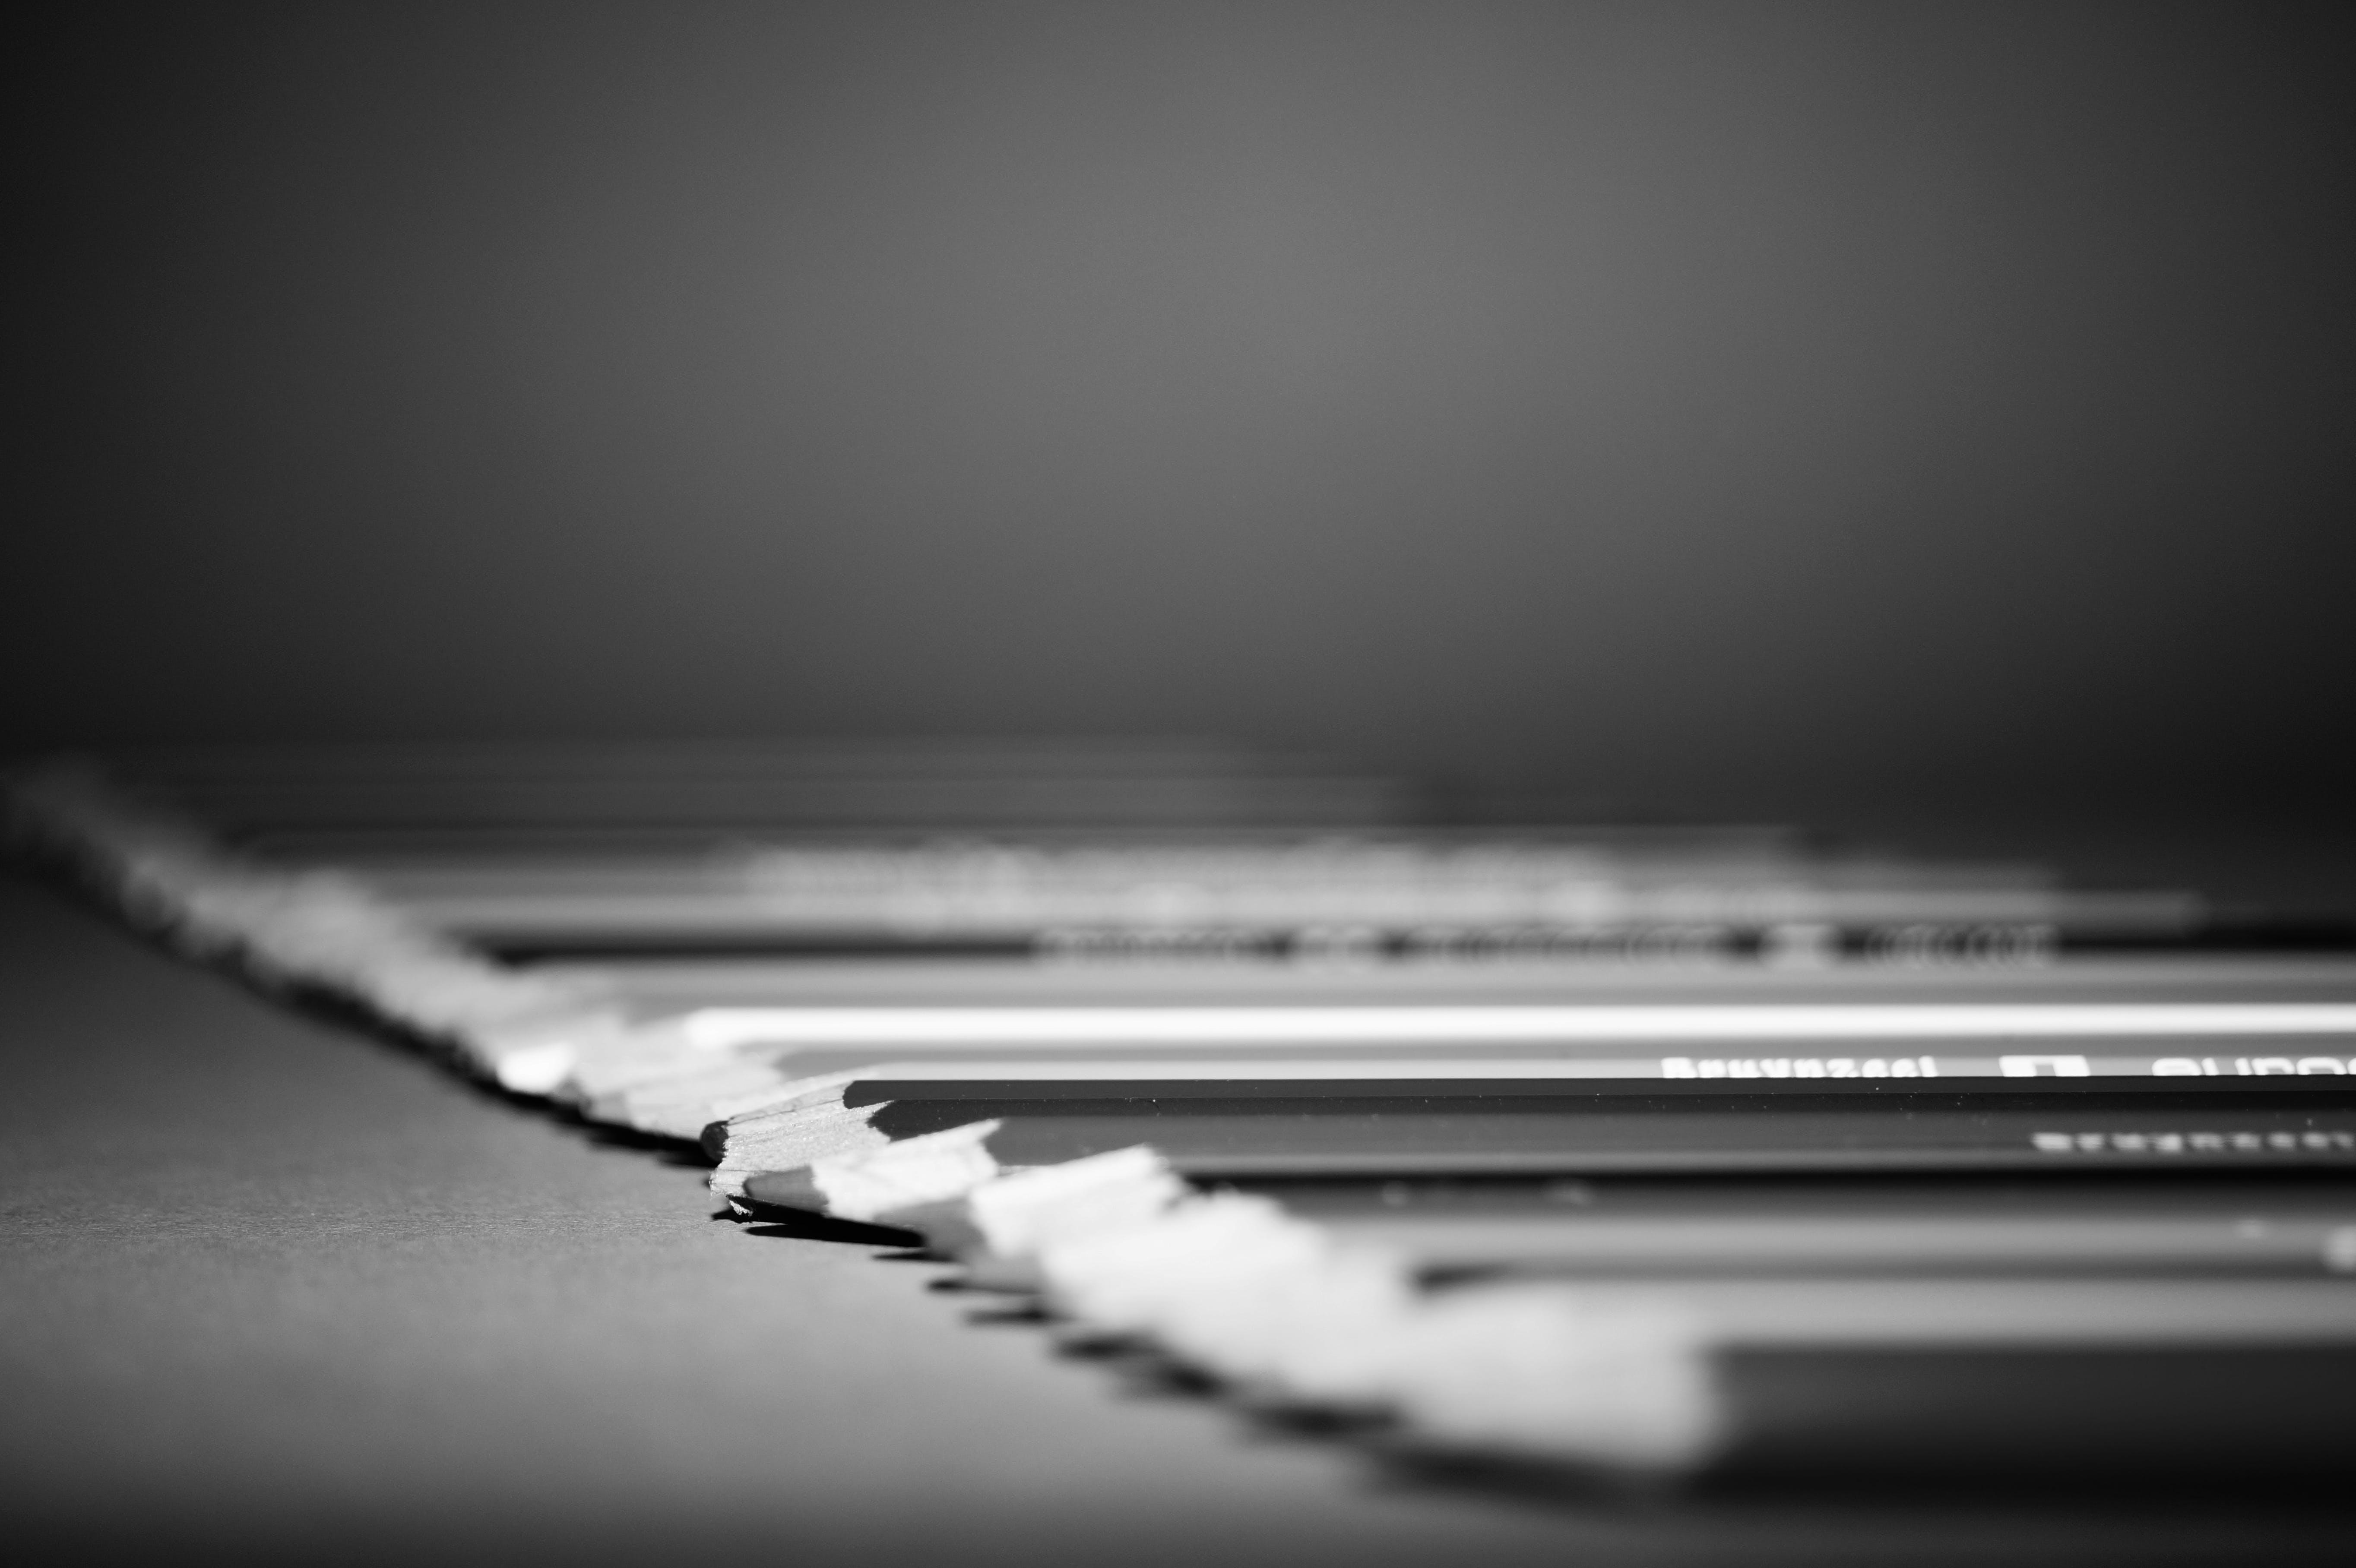 black and white, blur, blurry